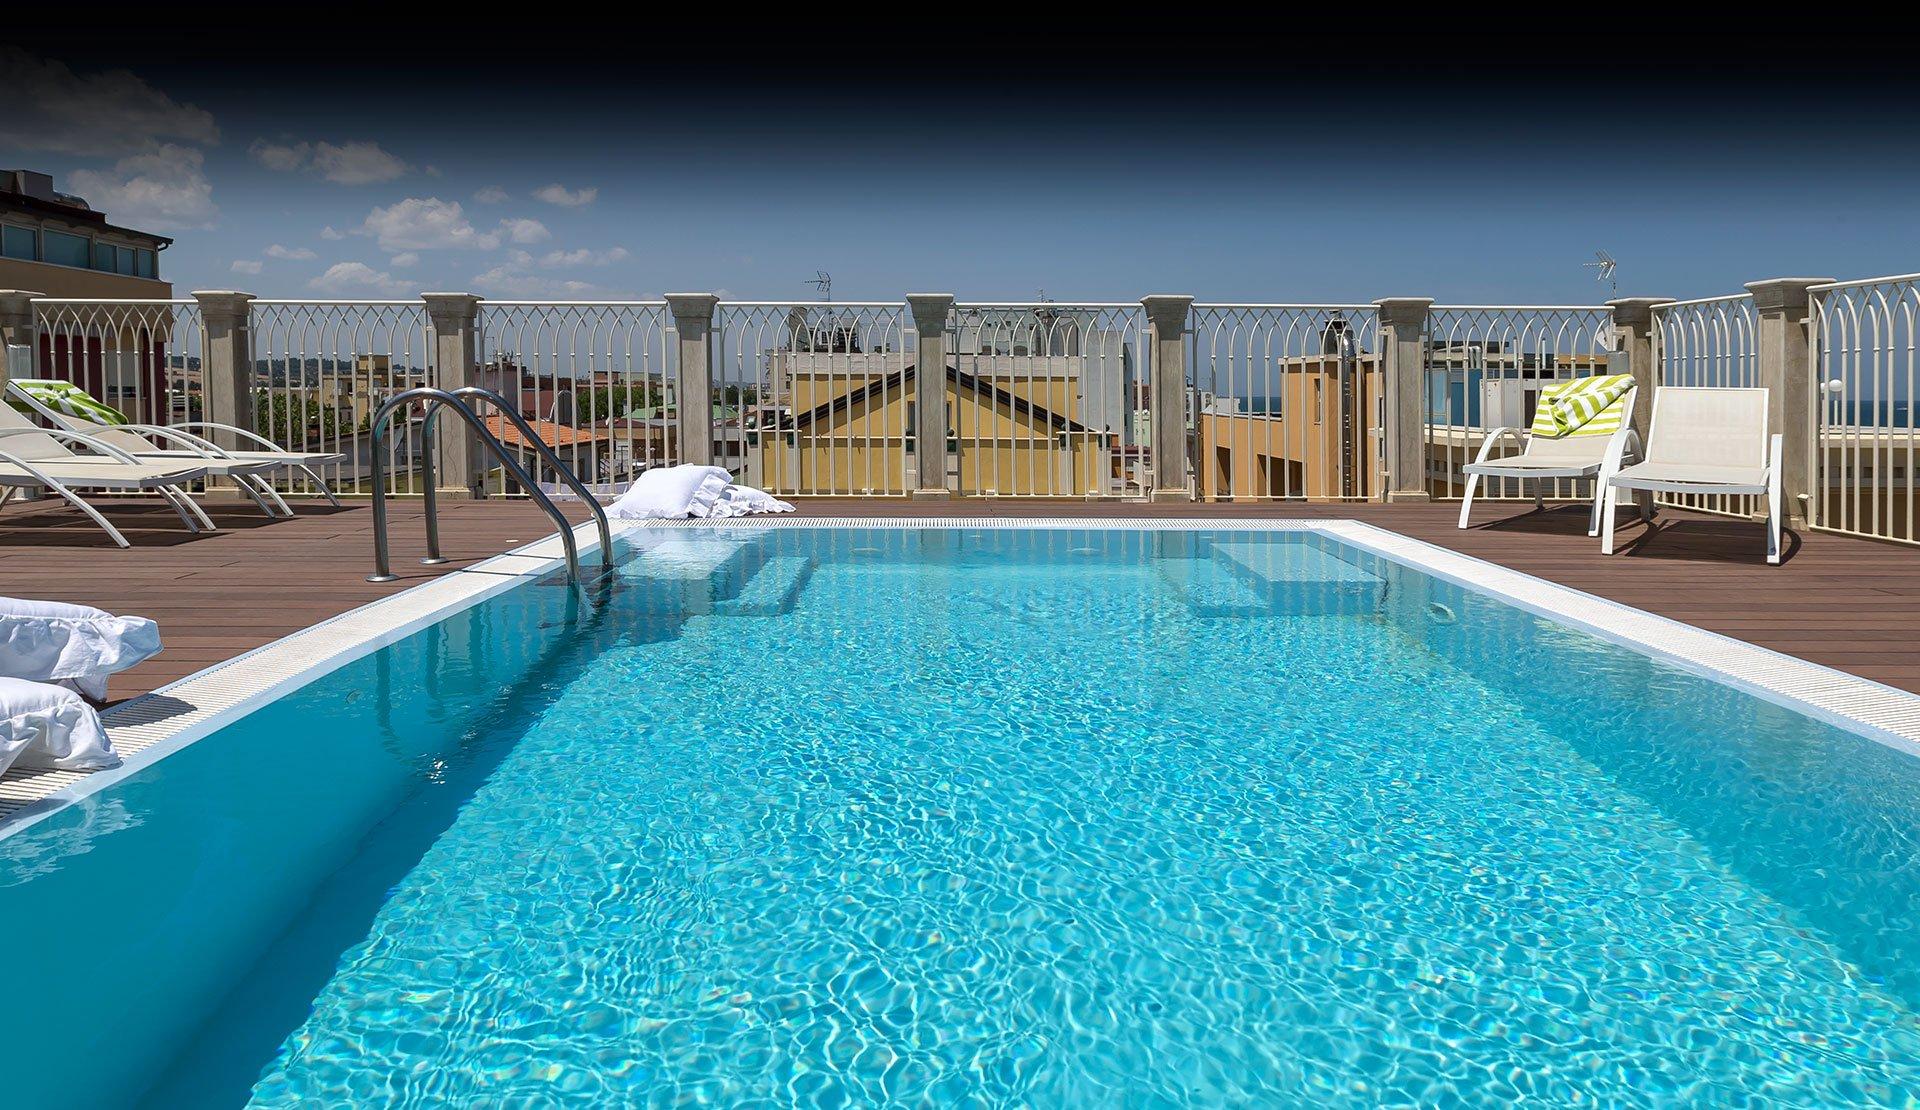 Hotel con piscina panoramica a misano adriatico hotel - Hotel misano adriatico con piscina ...